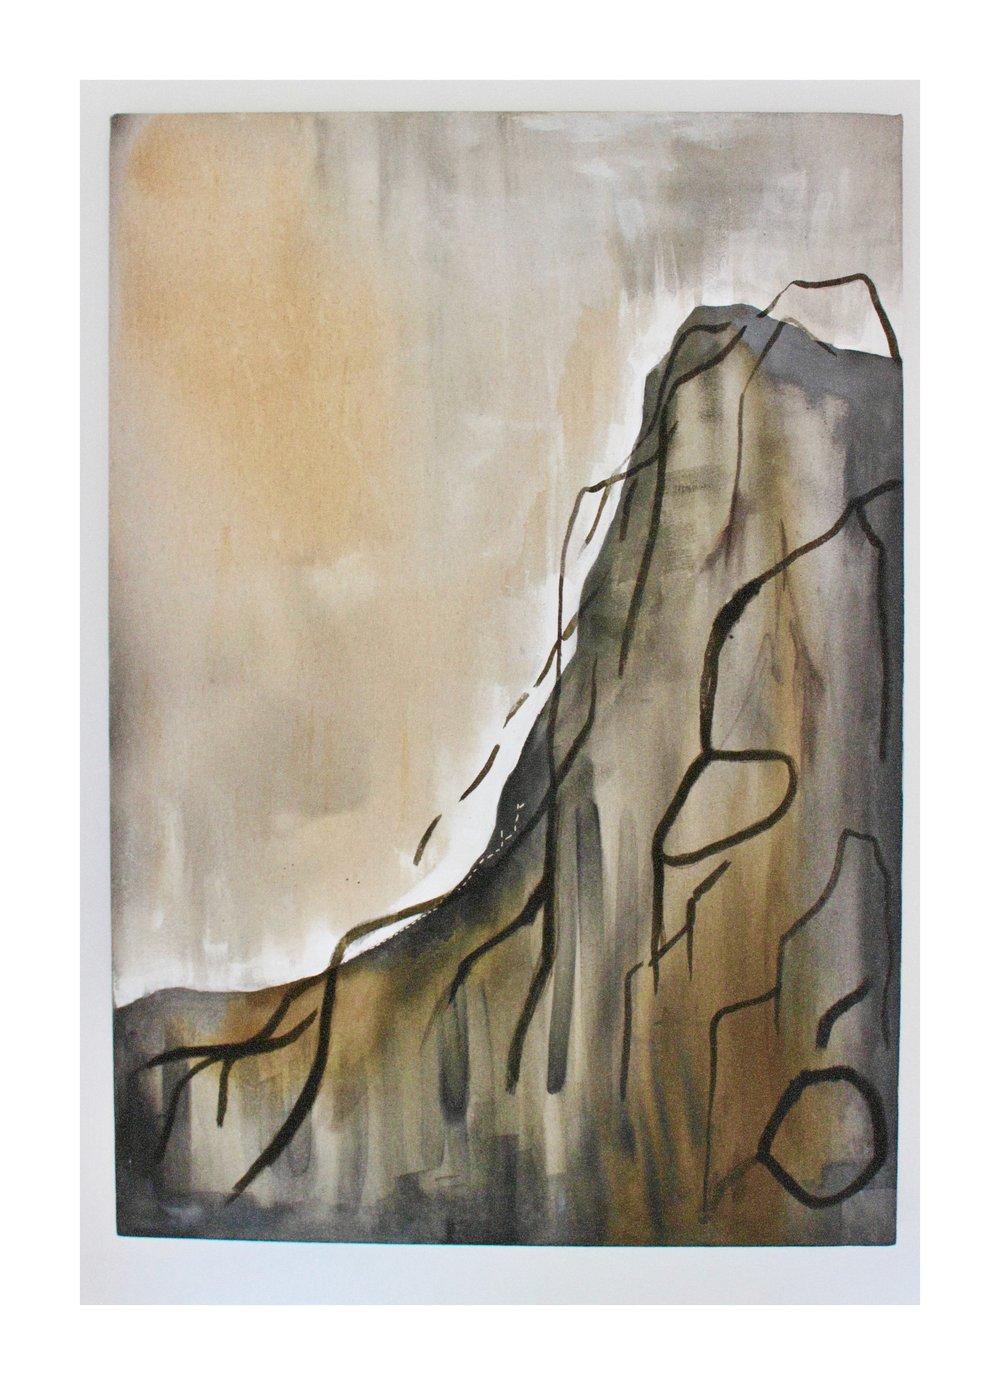 Etive Mor ~ Ink on Linen Canvas ~ 2018  100 cm x 70 cm